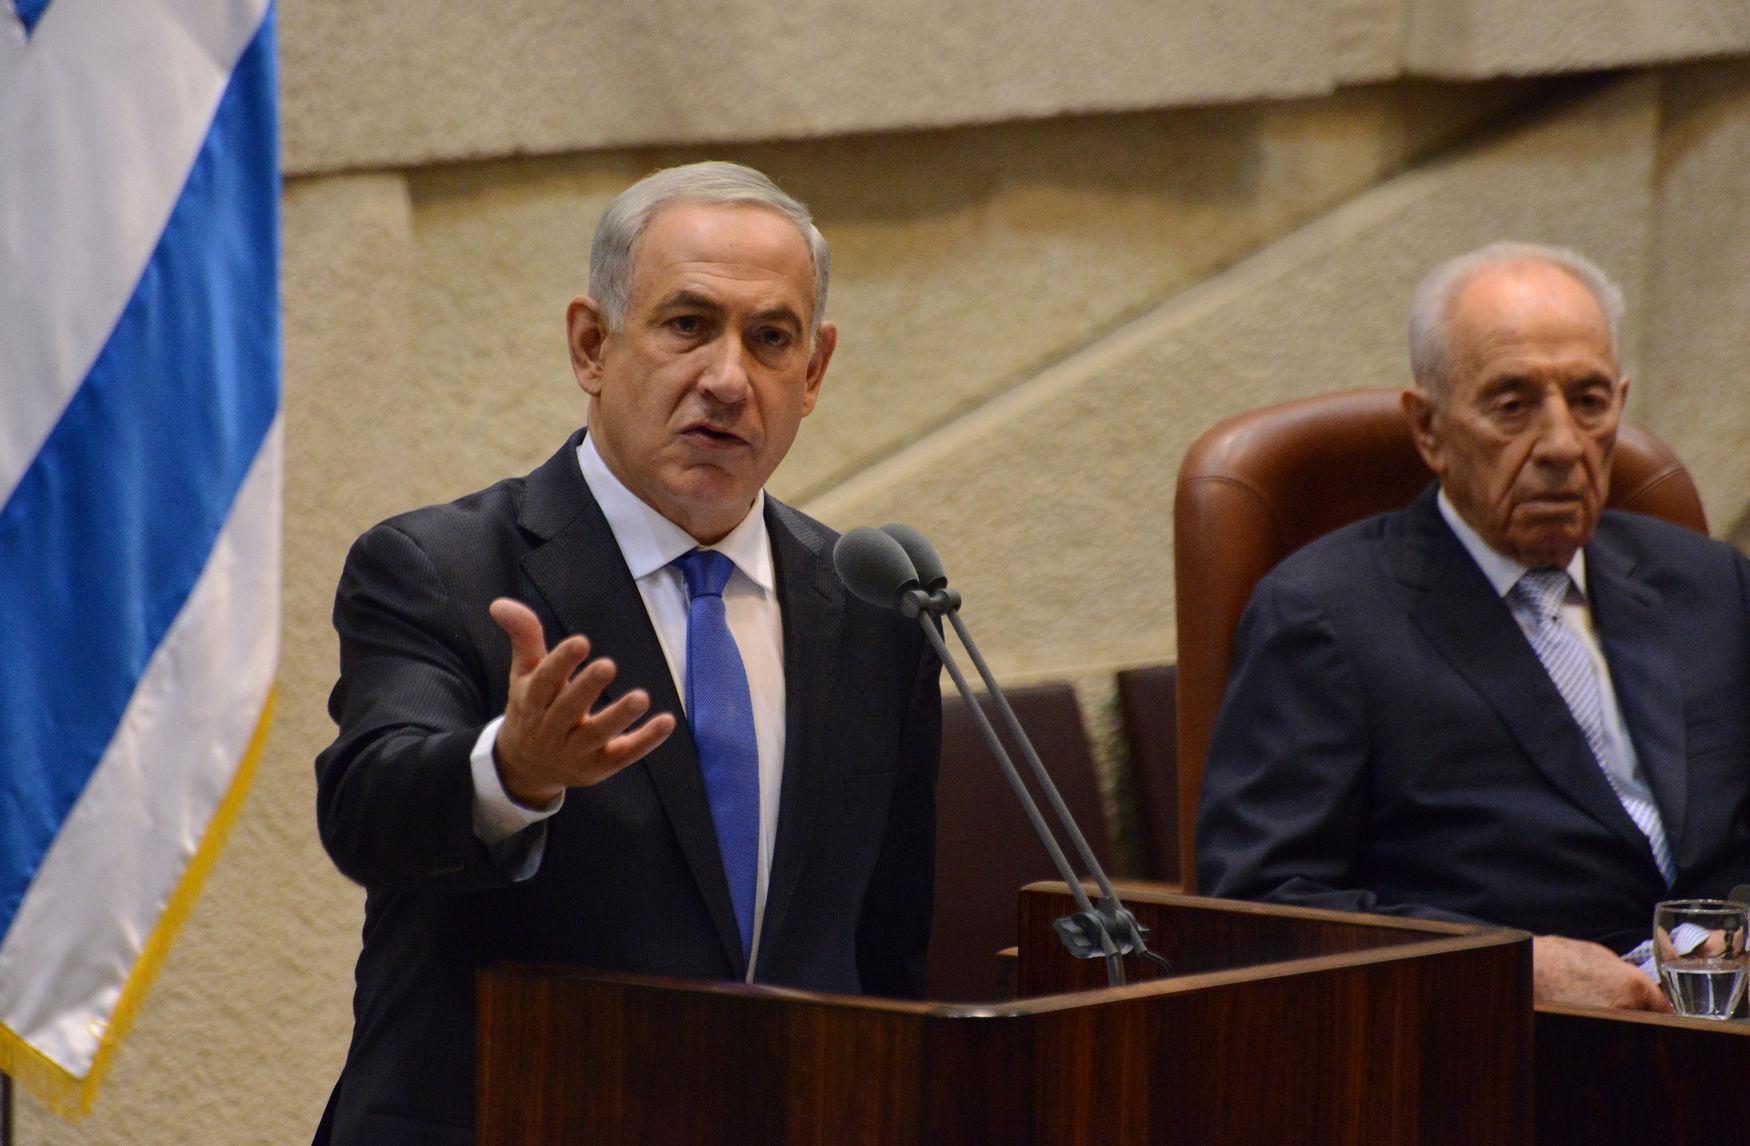 Israel Prime Minister Benjamin Netanyahu In Knesset